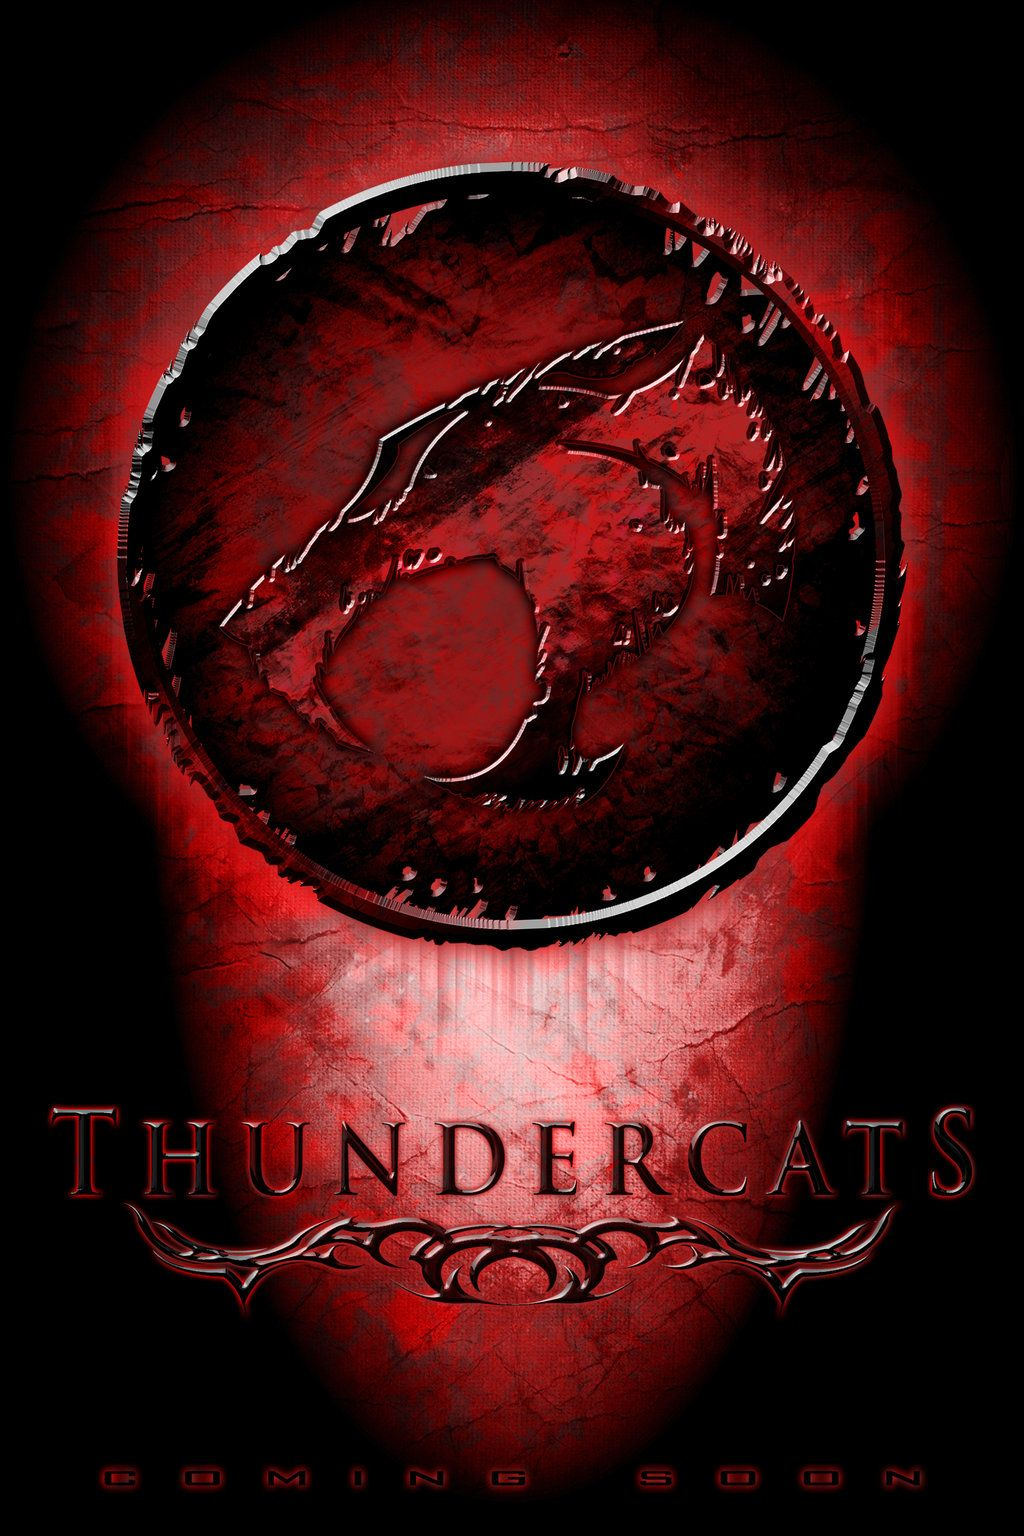 Thundercats Movie Poster By Roo157 On Deviantart Thundercats Movie Thundercats Thundercats Logo